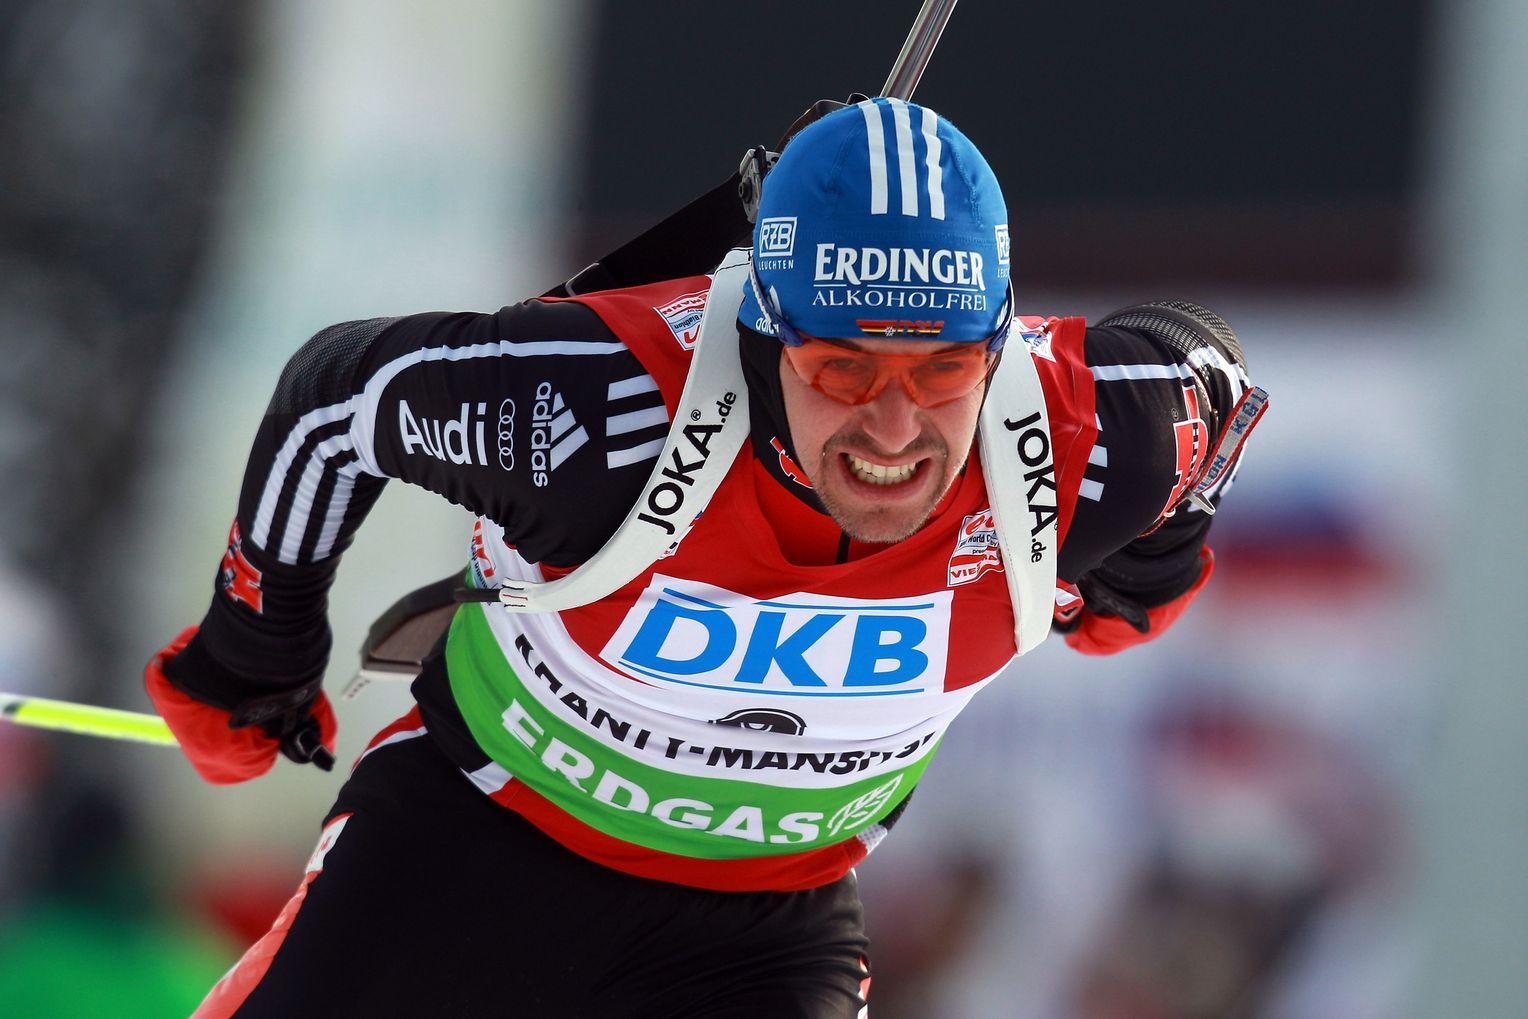 Biathlon heute live: Weltcup 2018/2019 in Oslo - Live